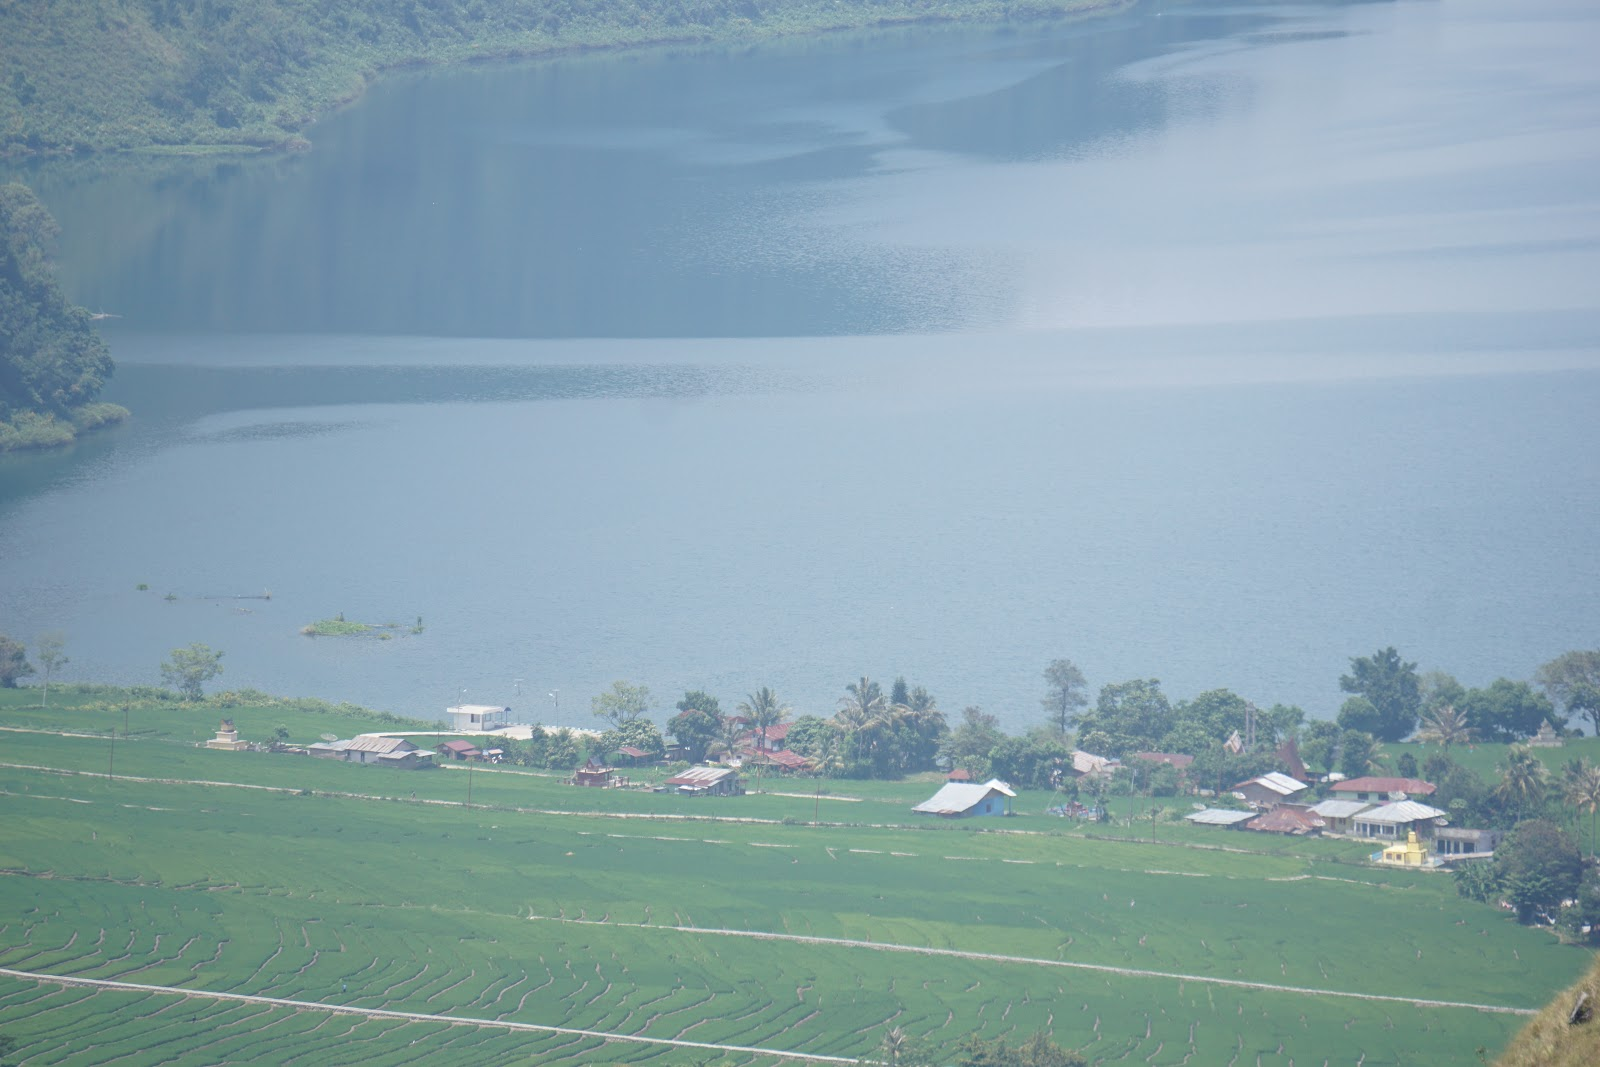 Desa Wisata Meat Balige Pesona Tersembunyi Keindahan Danau